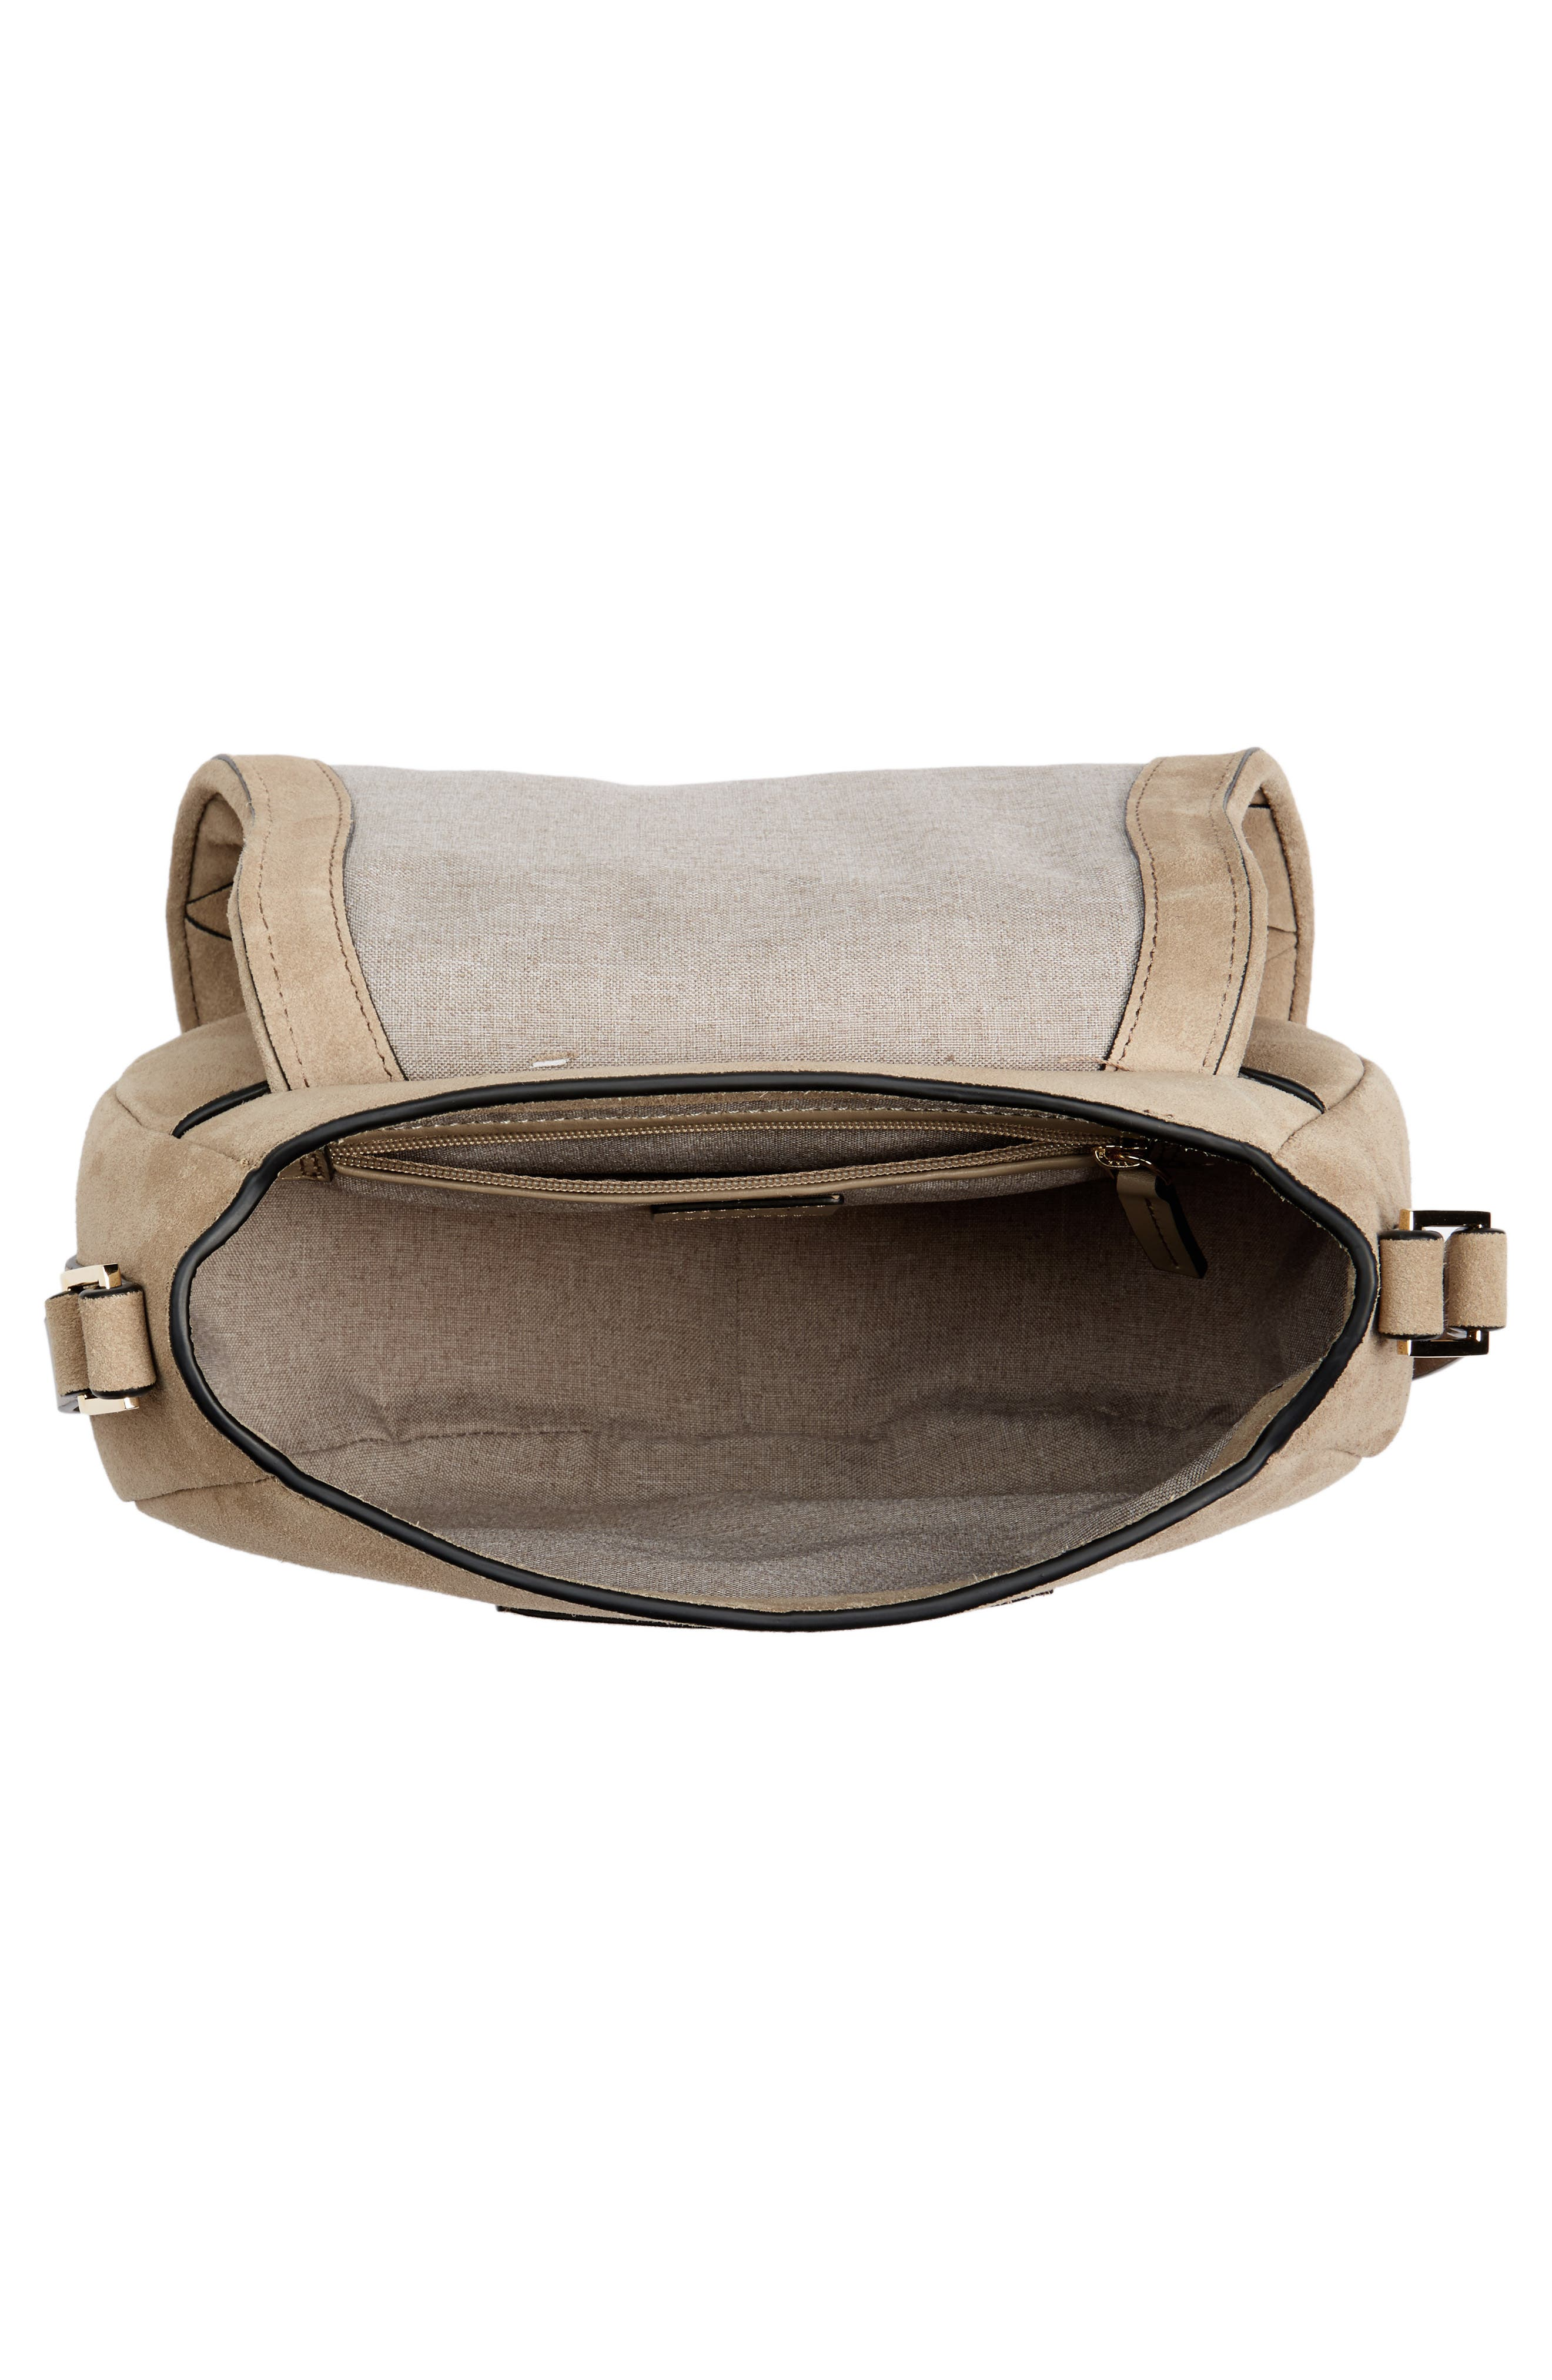 Escapade Suede Saddle Bag,                             Alternate thumbnail 4, color,                             Desert Taupe